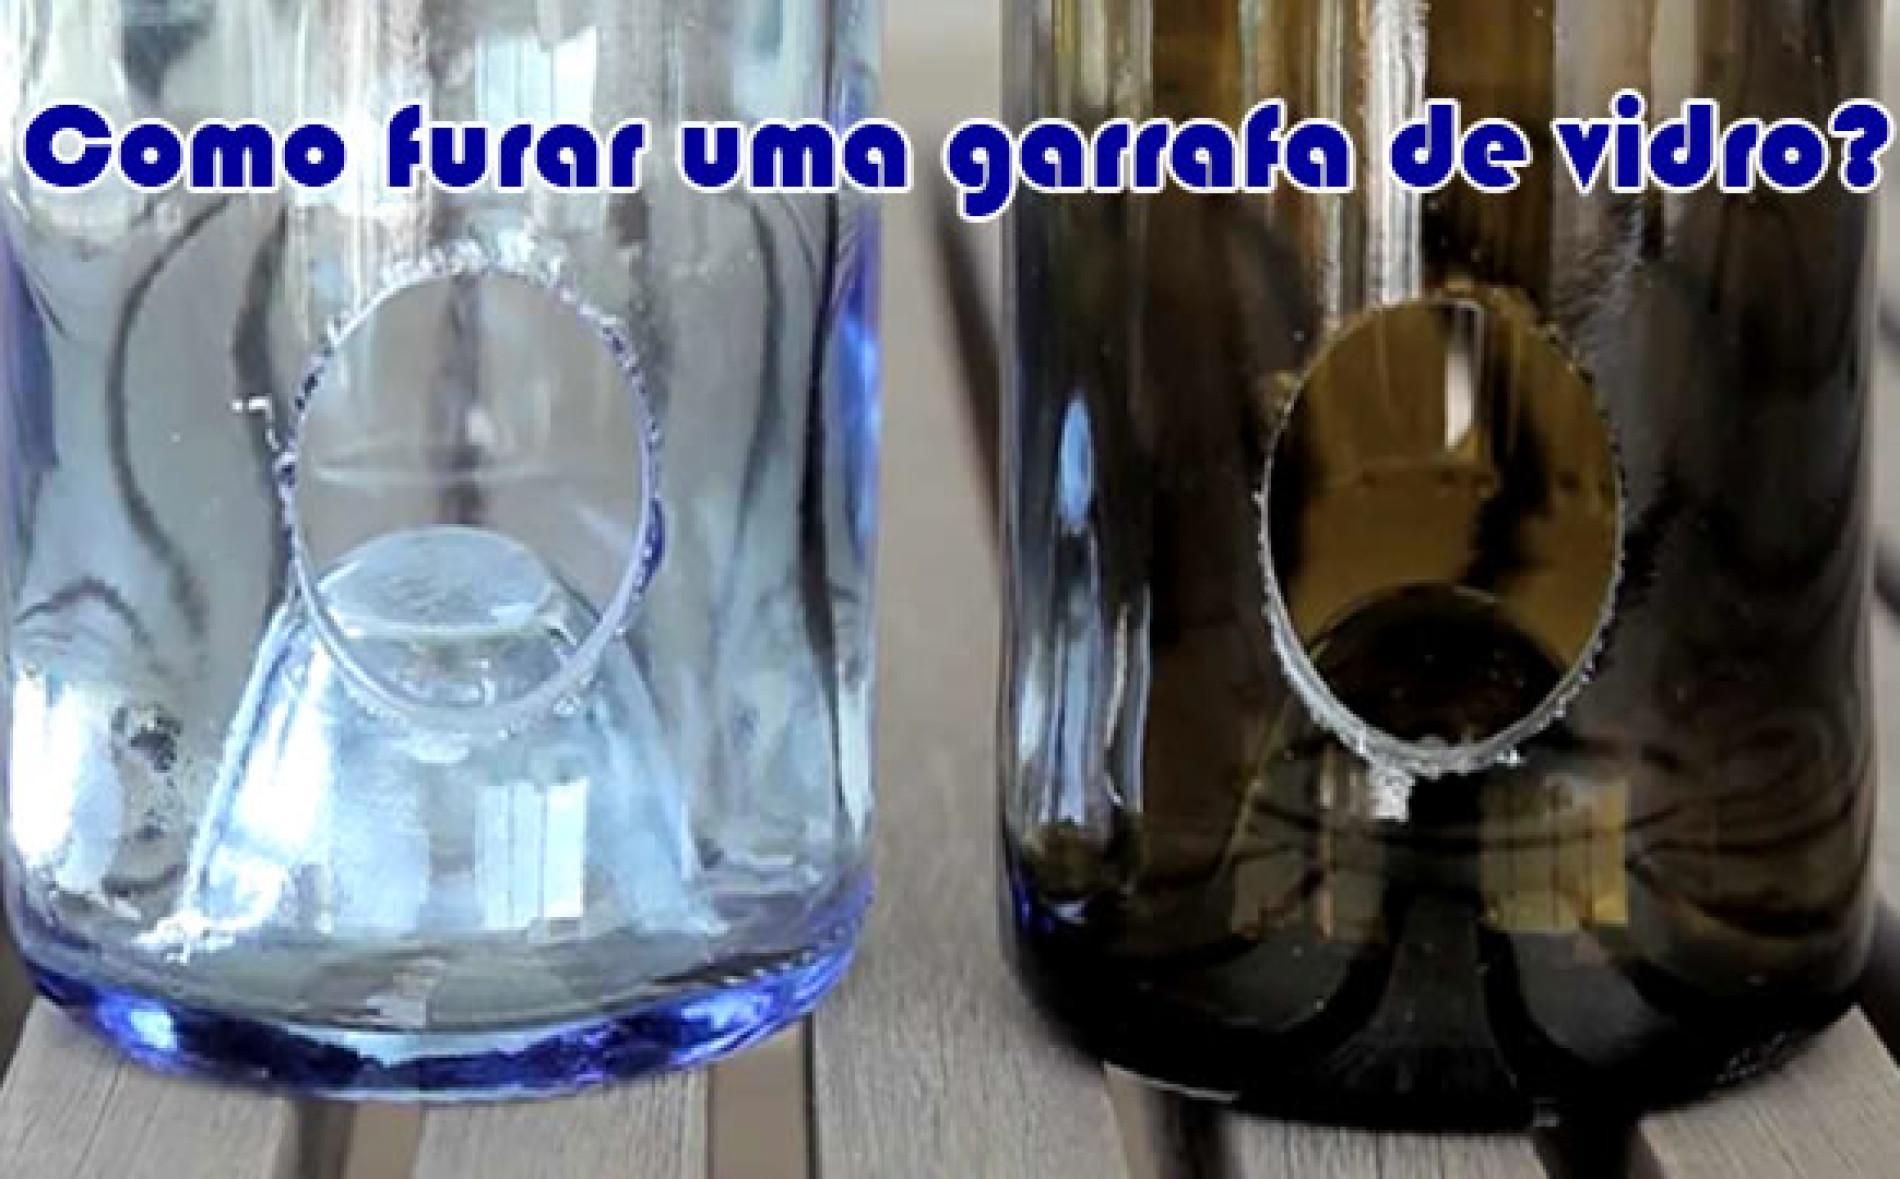 Como furar uma garrafa de vidro?